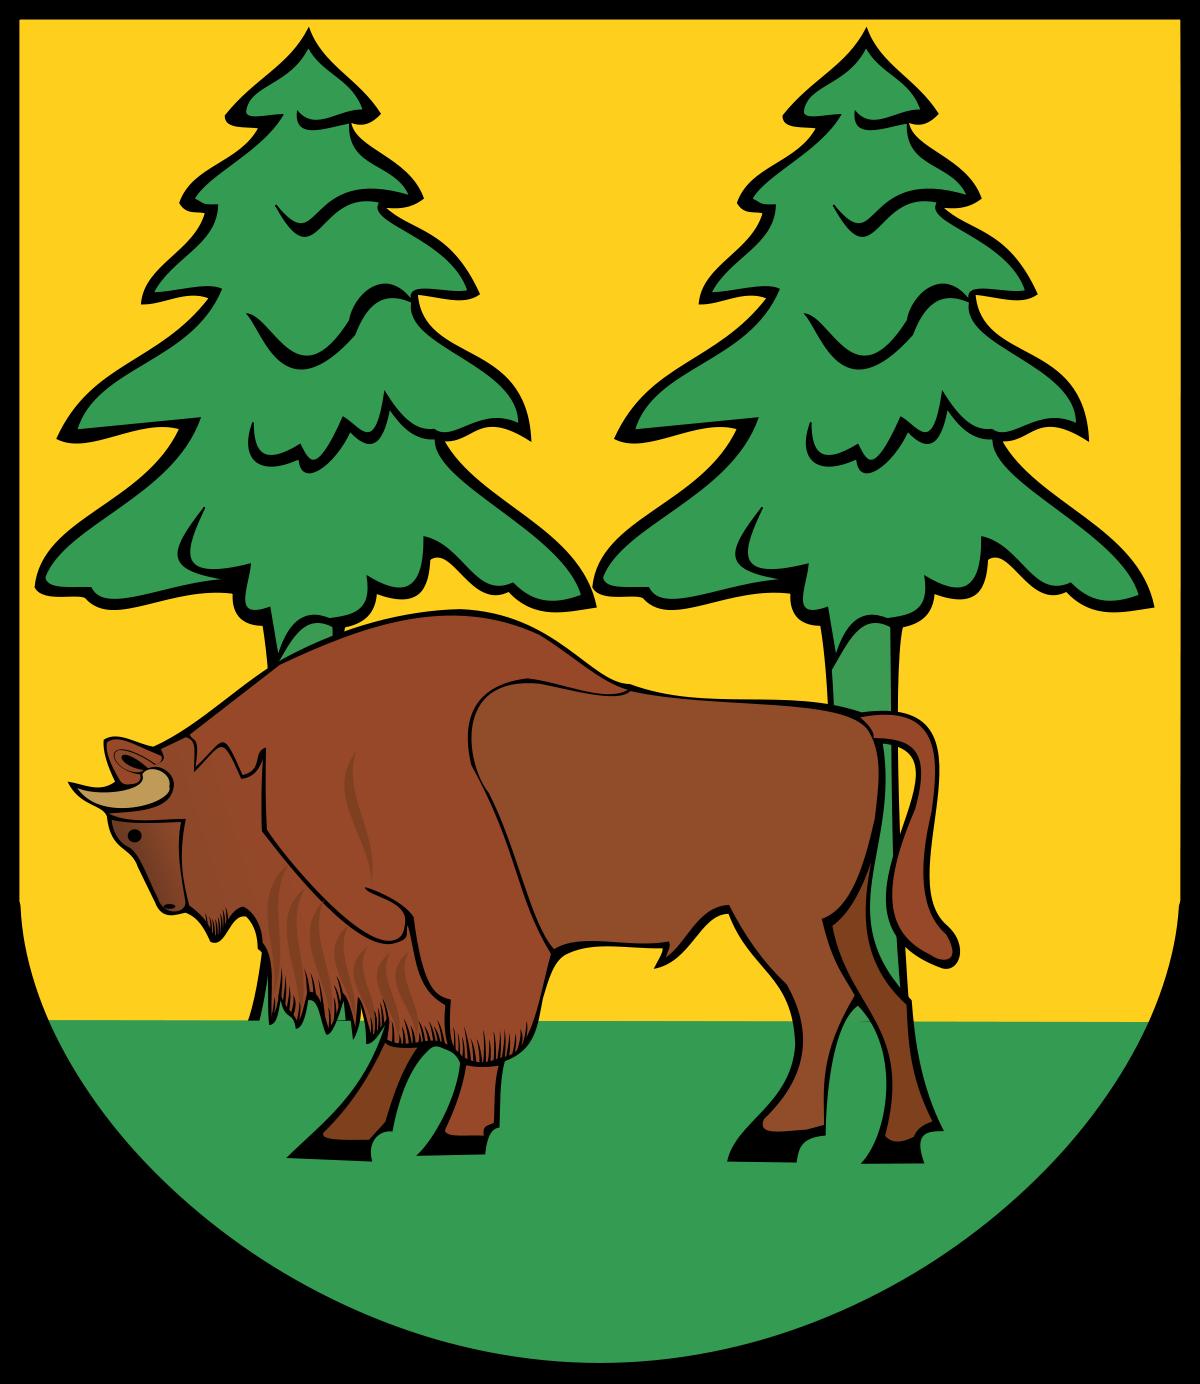 hajnowski